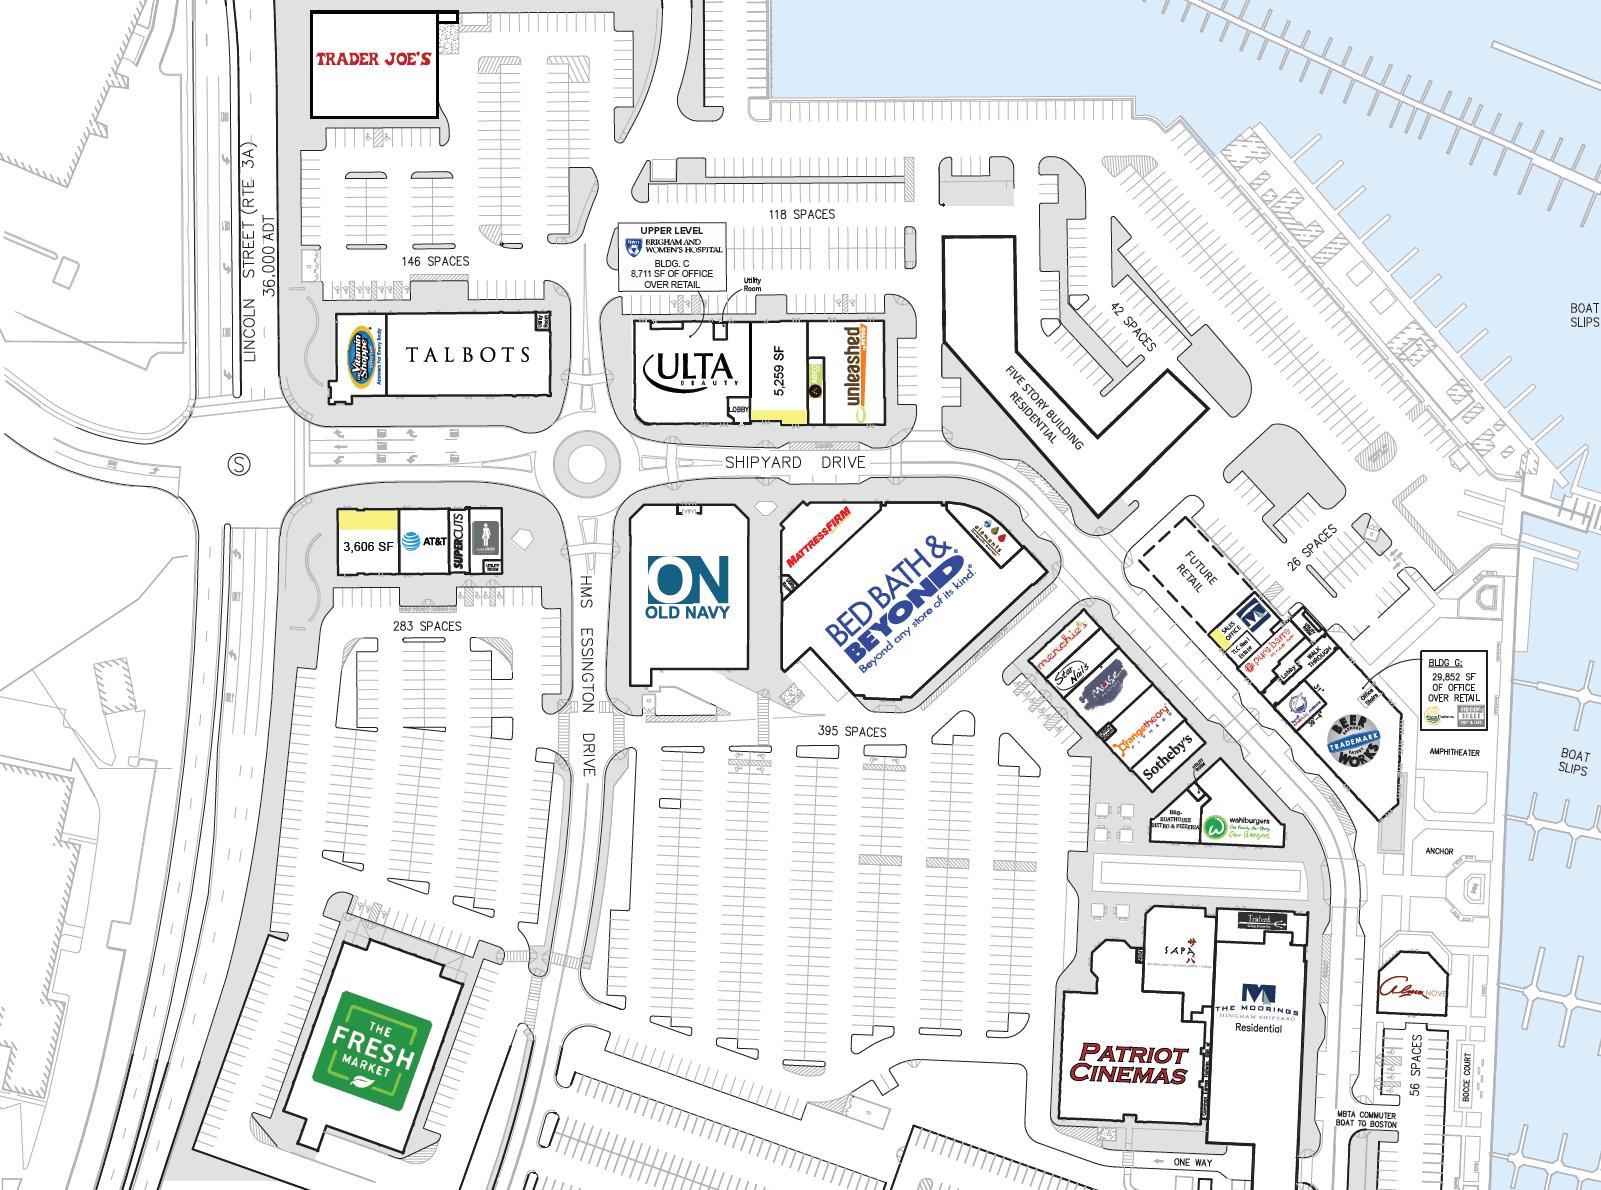 Hingham Shipyard Map drawing of retail spaces